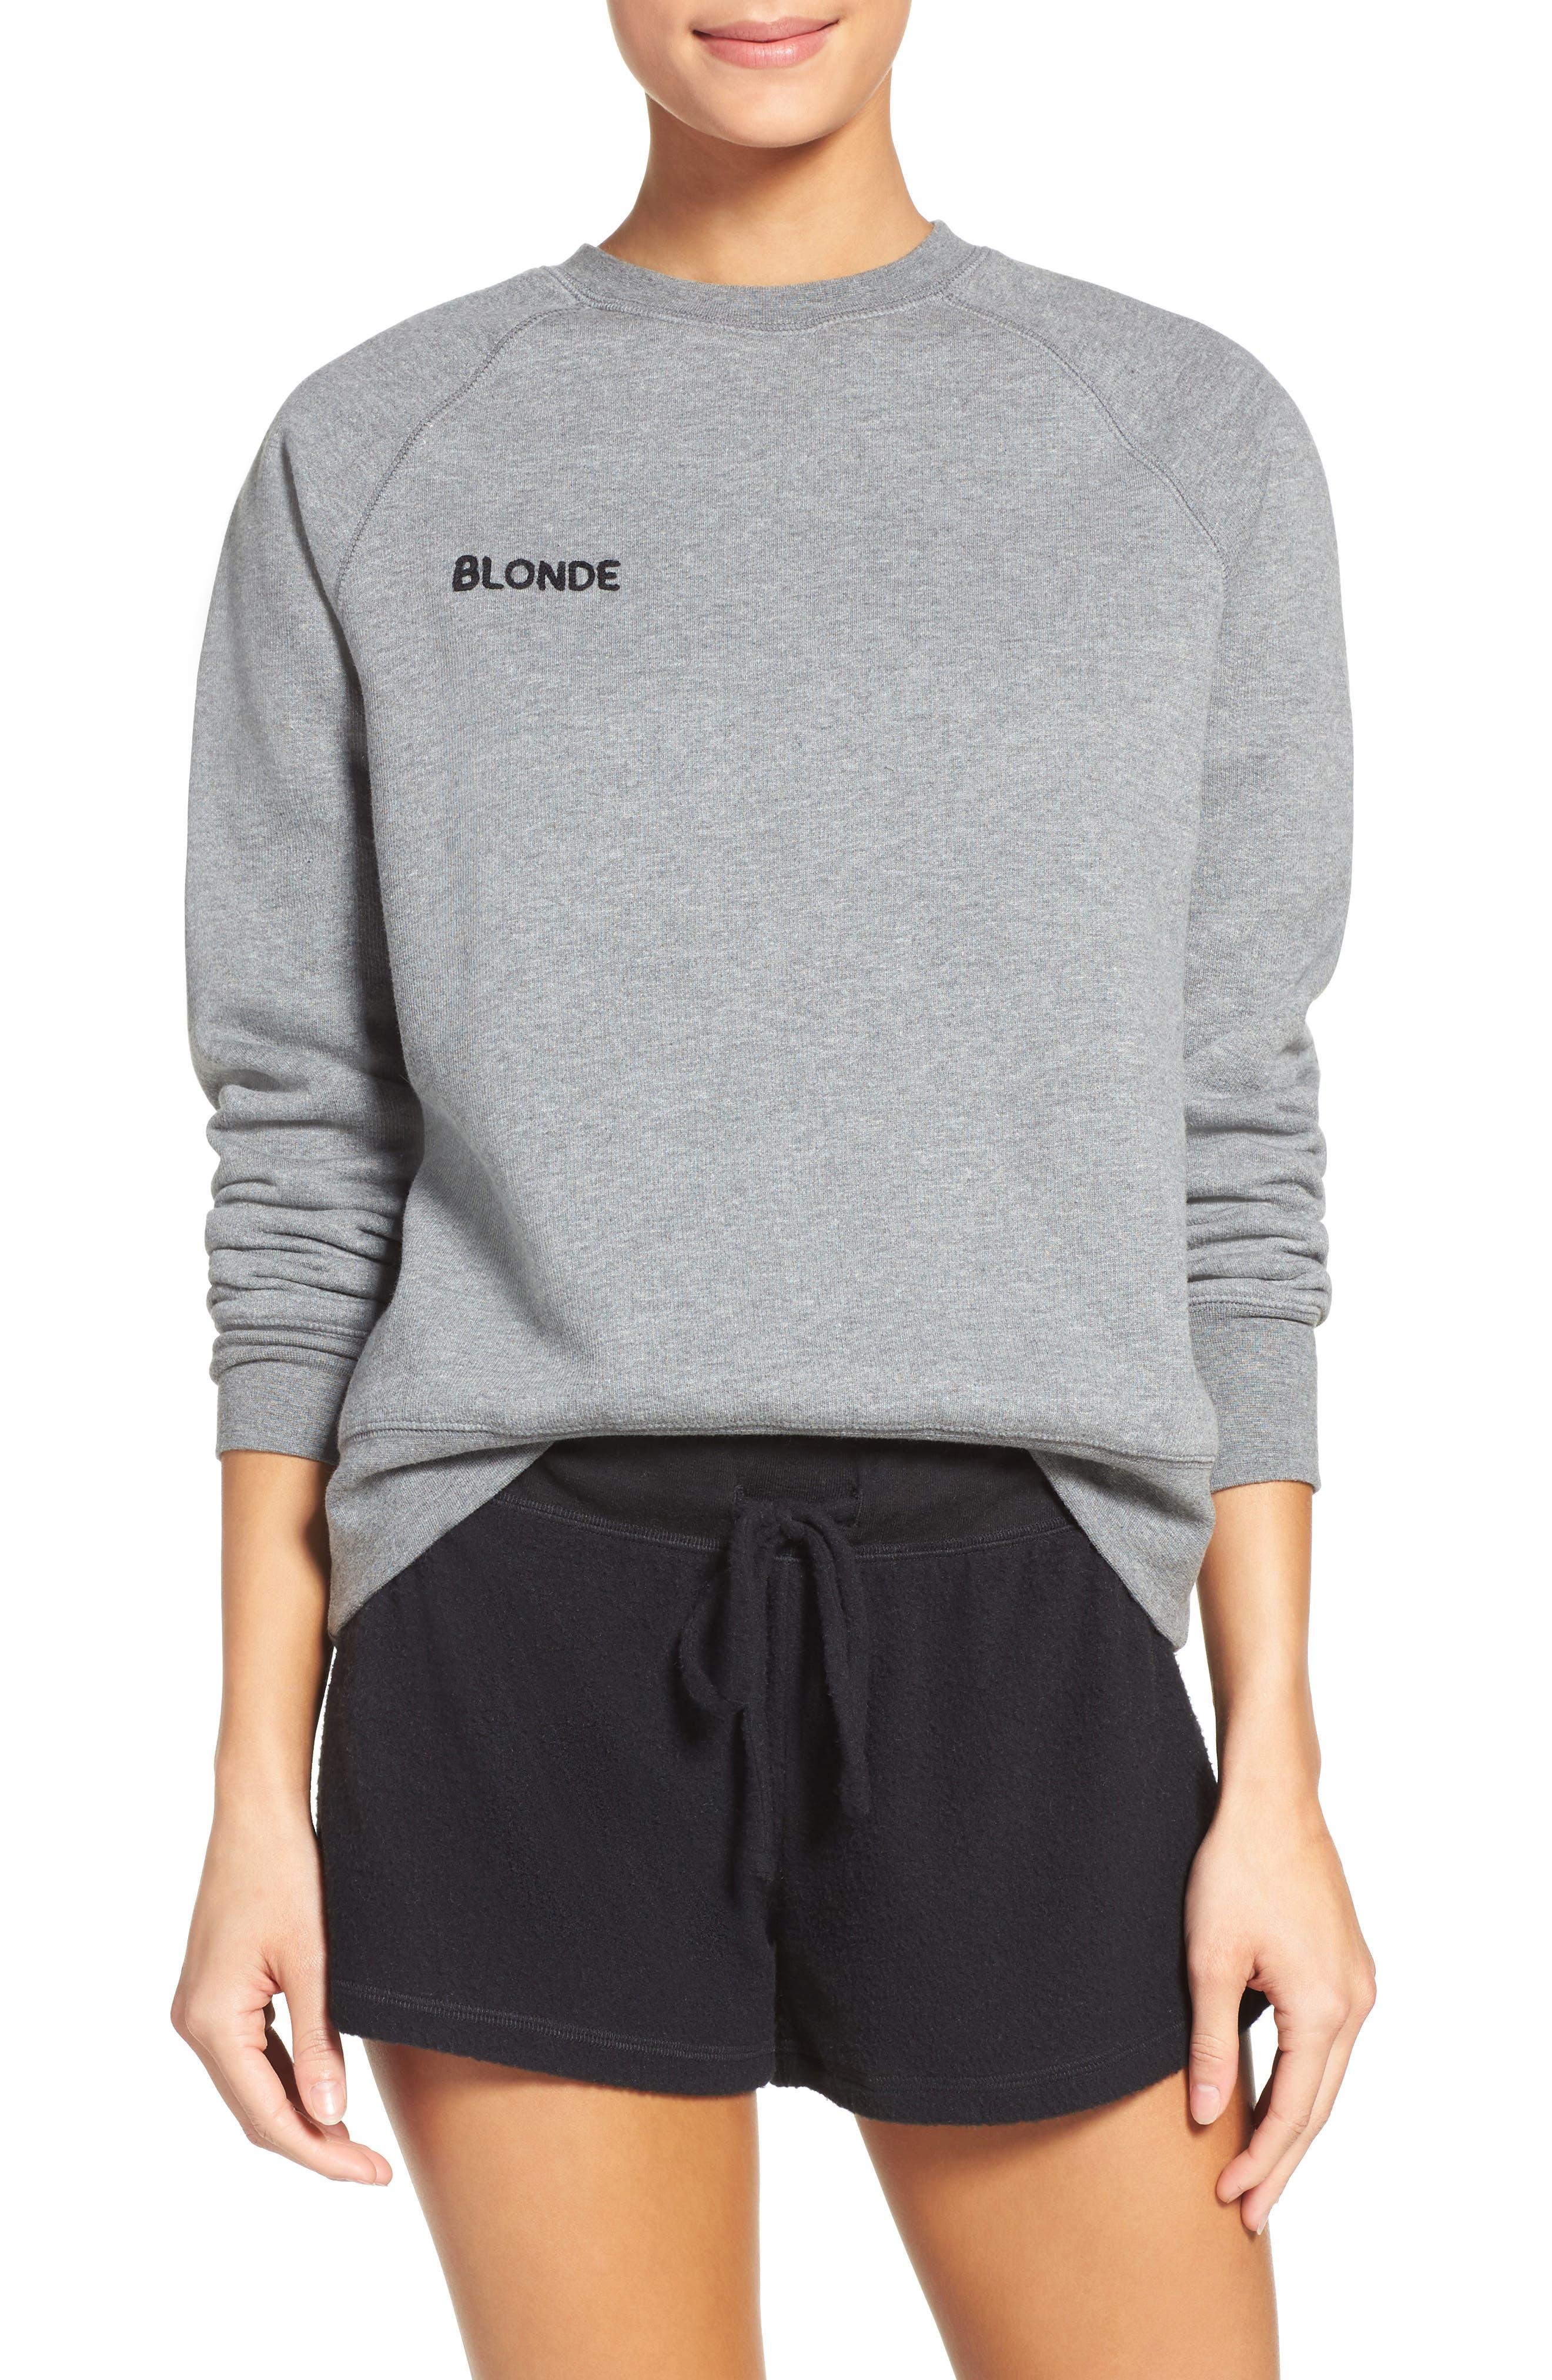 Blonde Crewneck Sweatshirt,                             Main thumbnail 1, color,                             Heather Grey